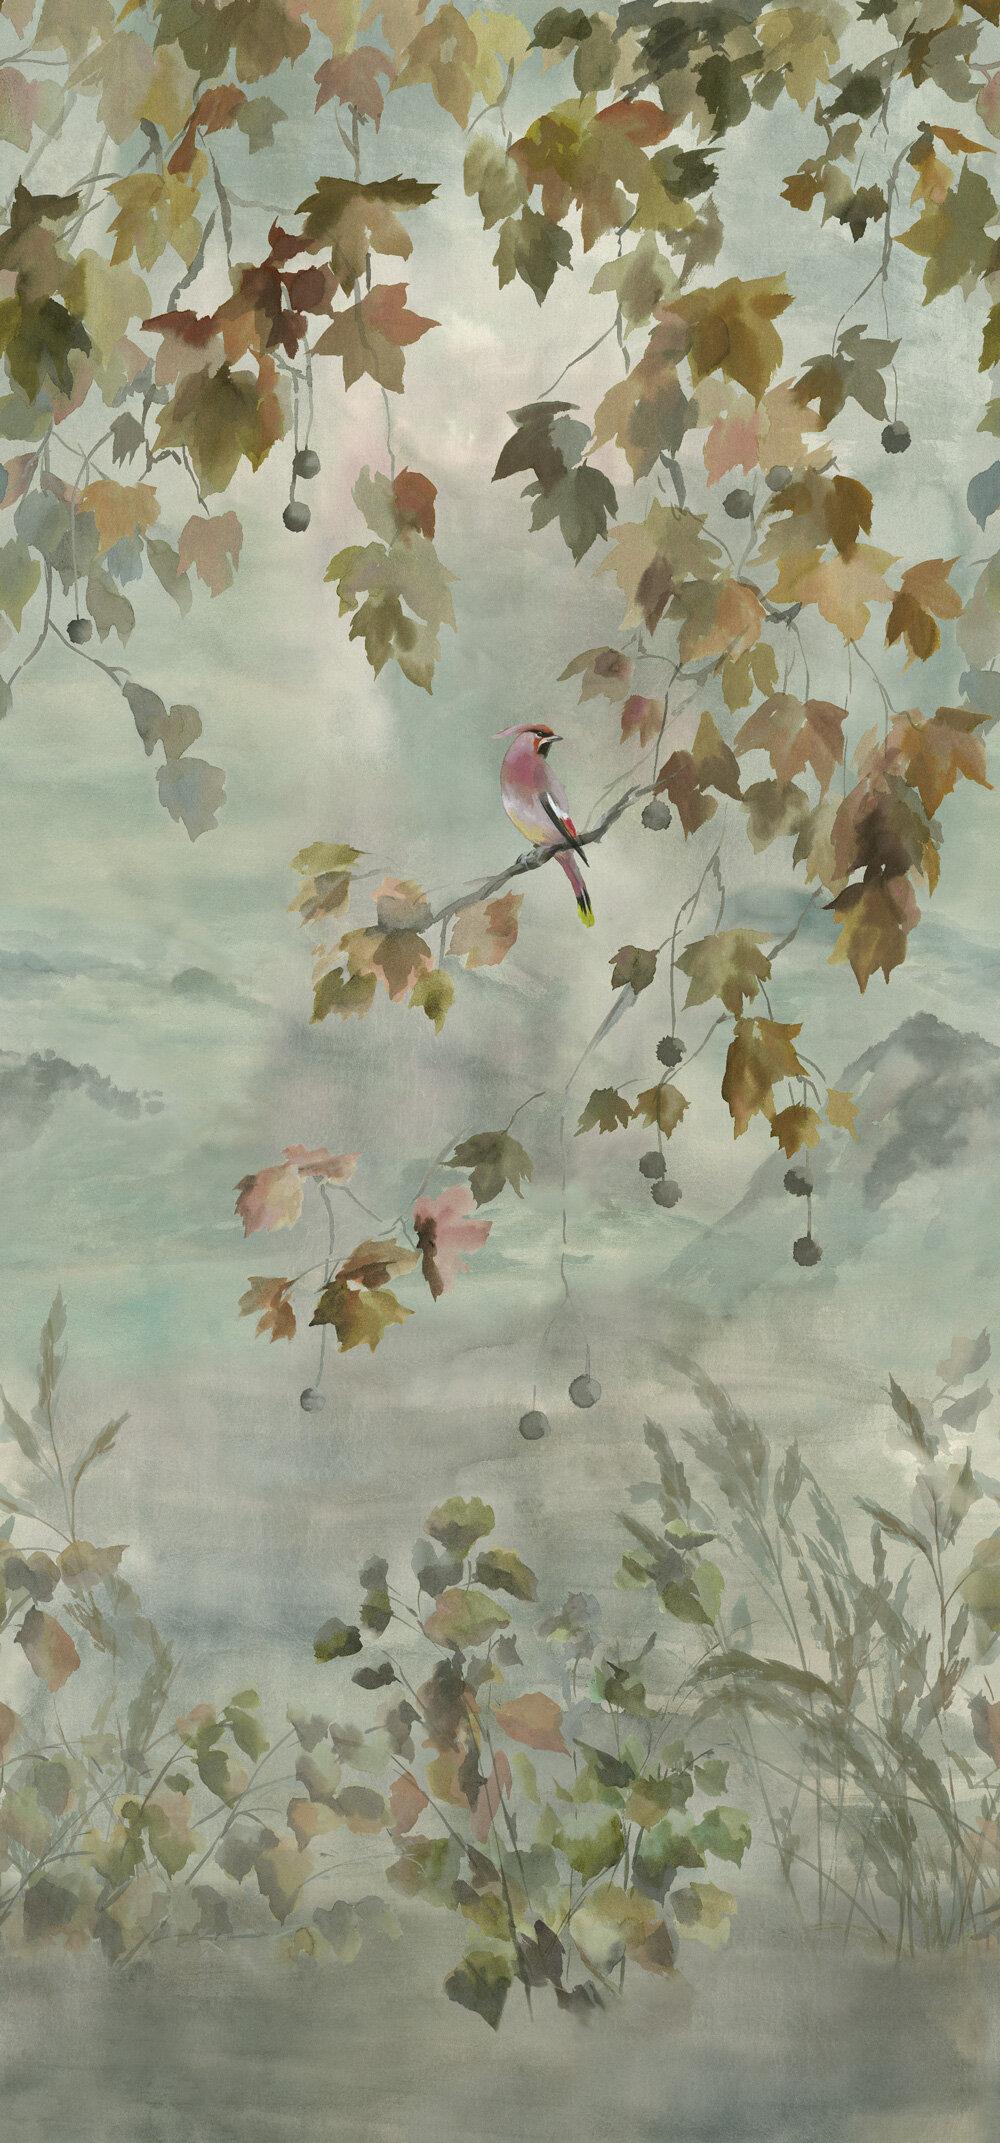 Miyako Scene 2 Mural - Dove - by Designers Guild